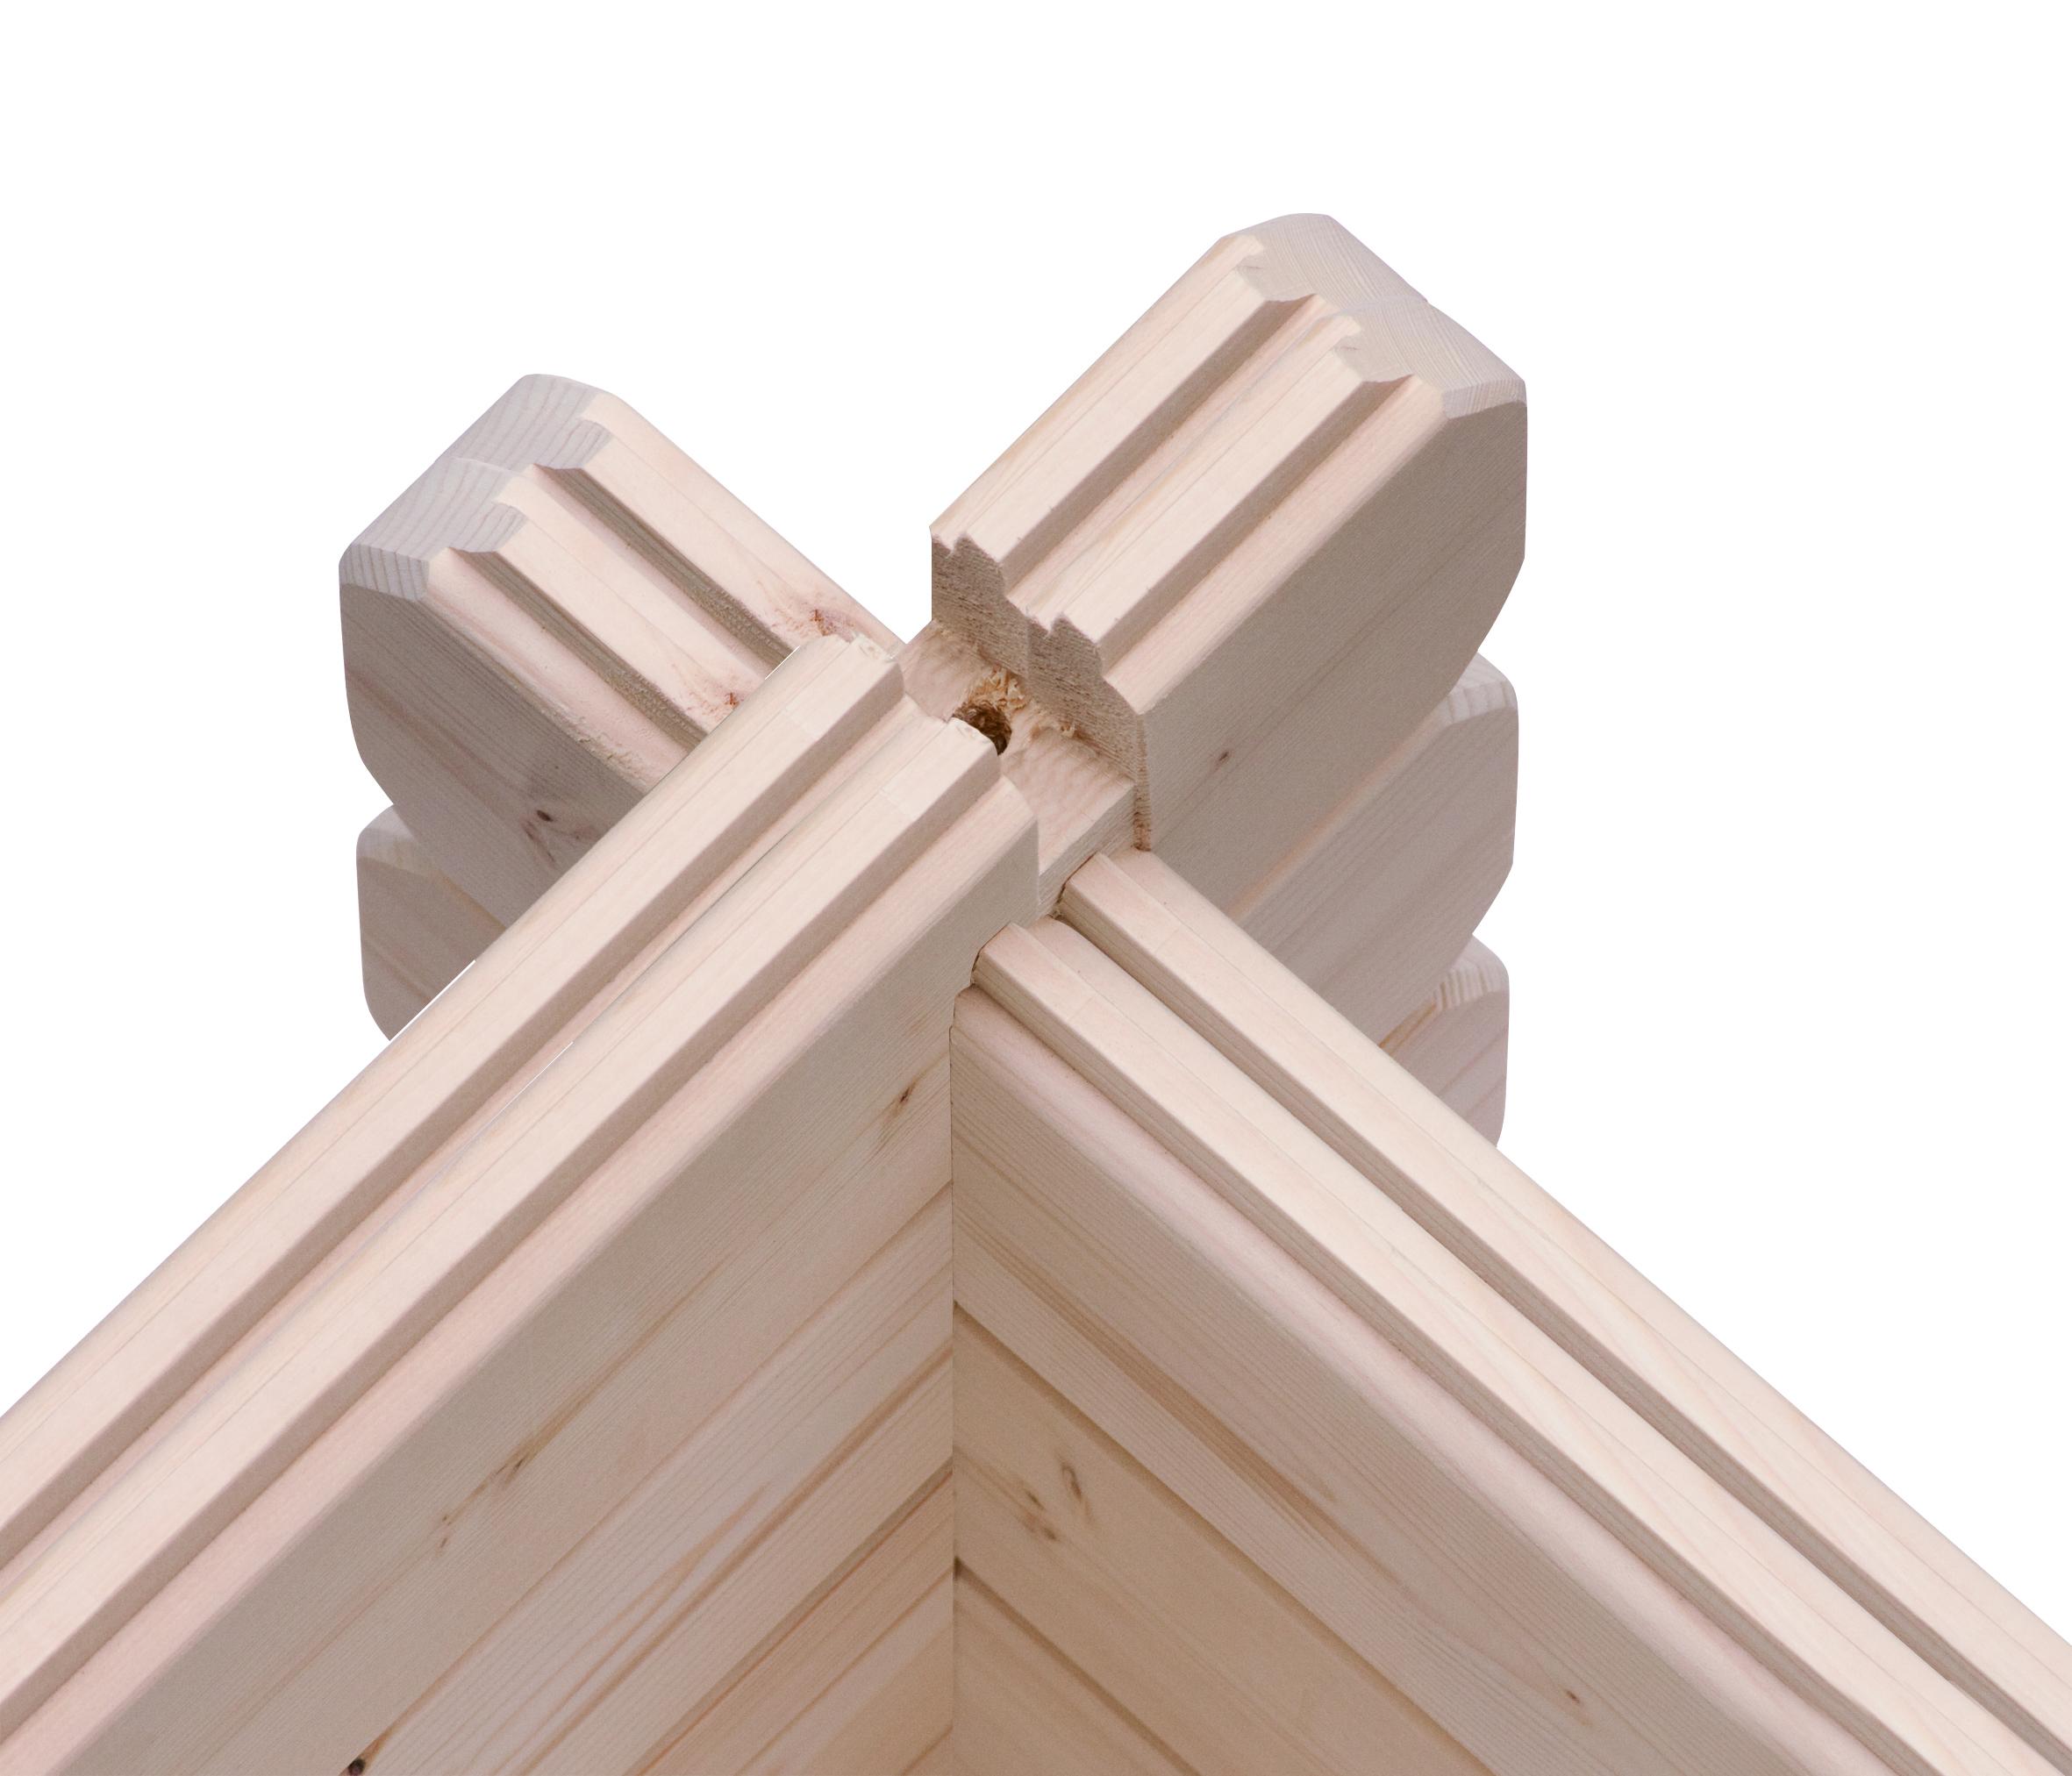 Woodfeeling Gartenhaus 38 mm Meldorf 6 VD+Terrasse natur 404x590cm Bild 8